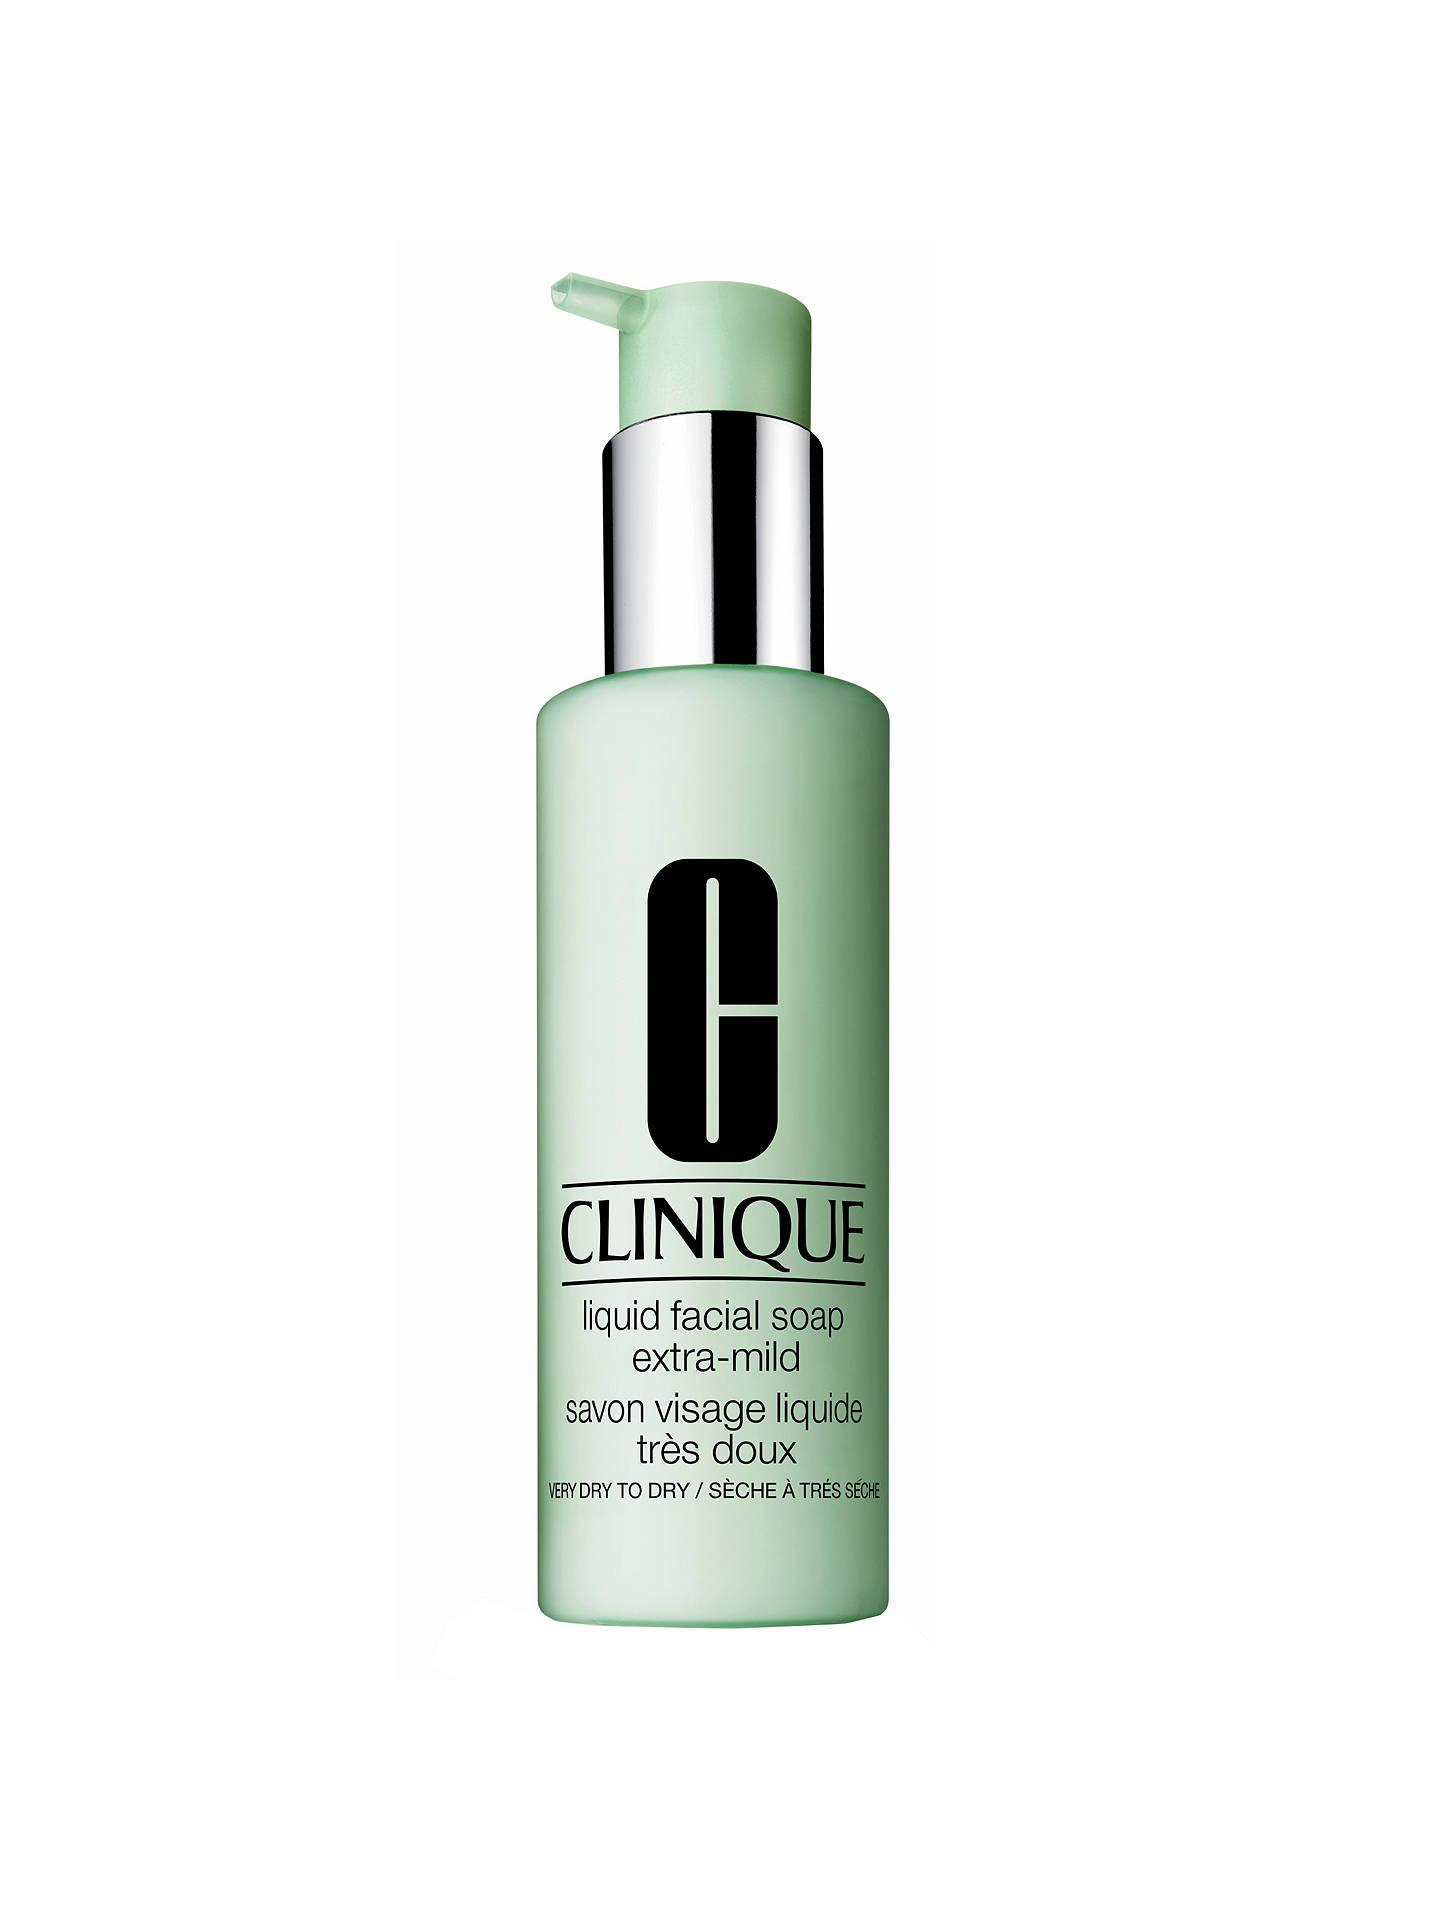 Clinique - Liquid Facial Soap Extra Mild 200 ml. /Skin Care